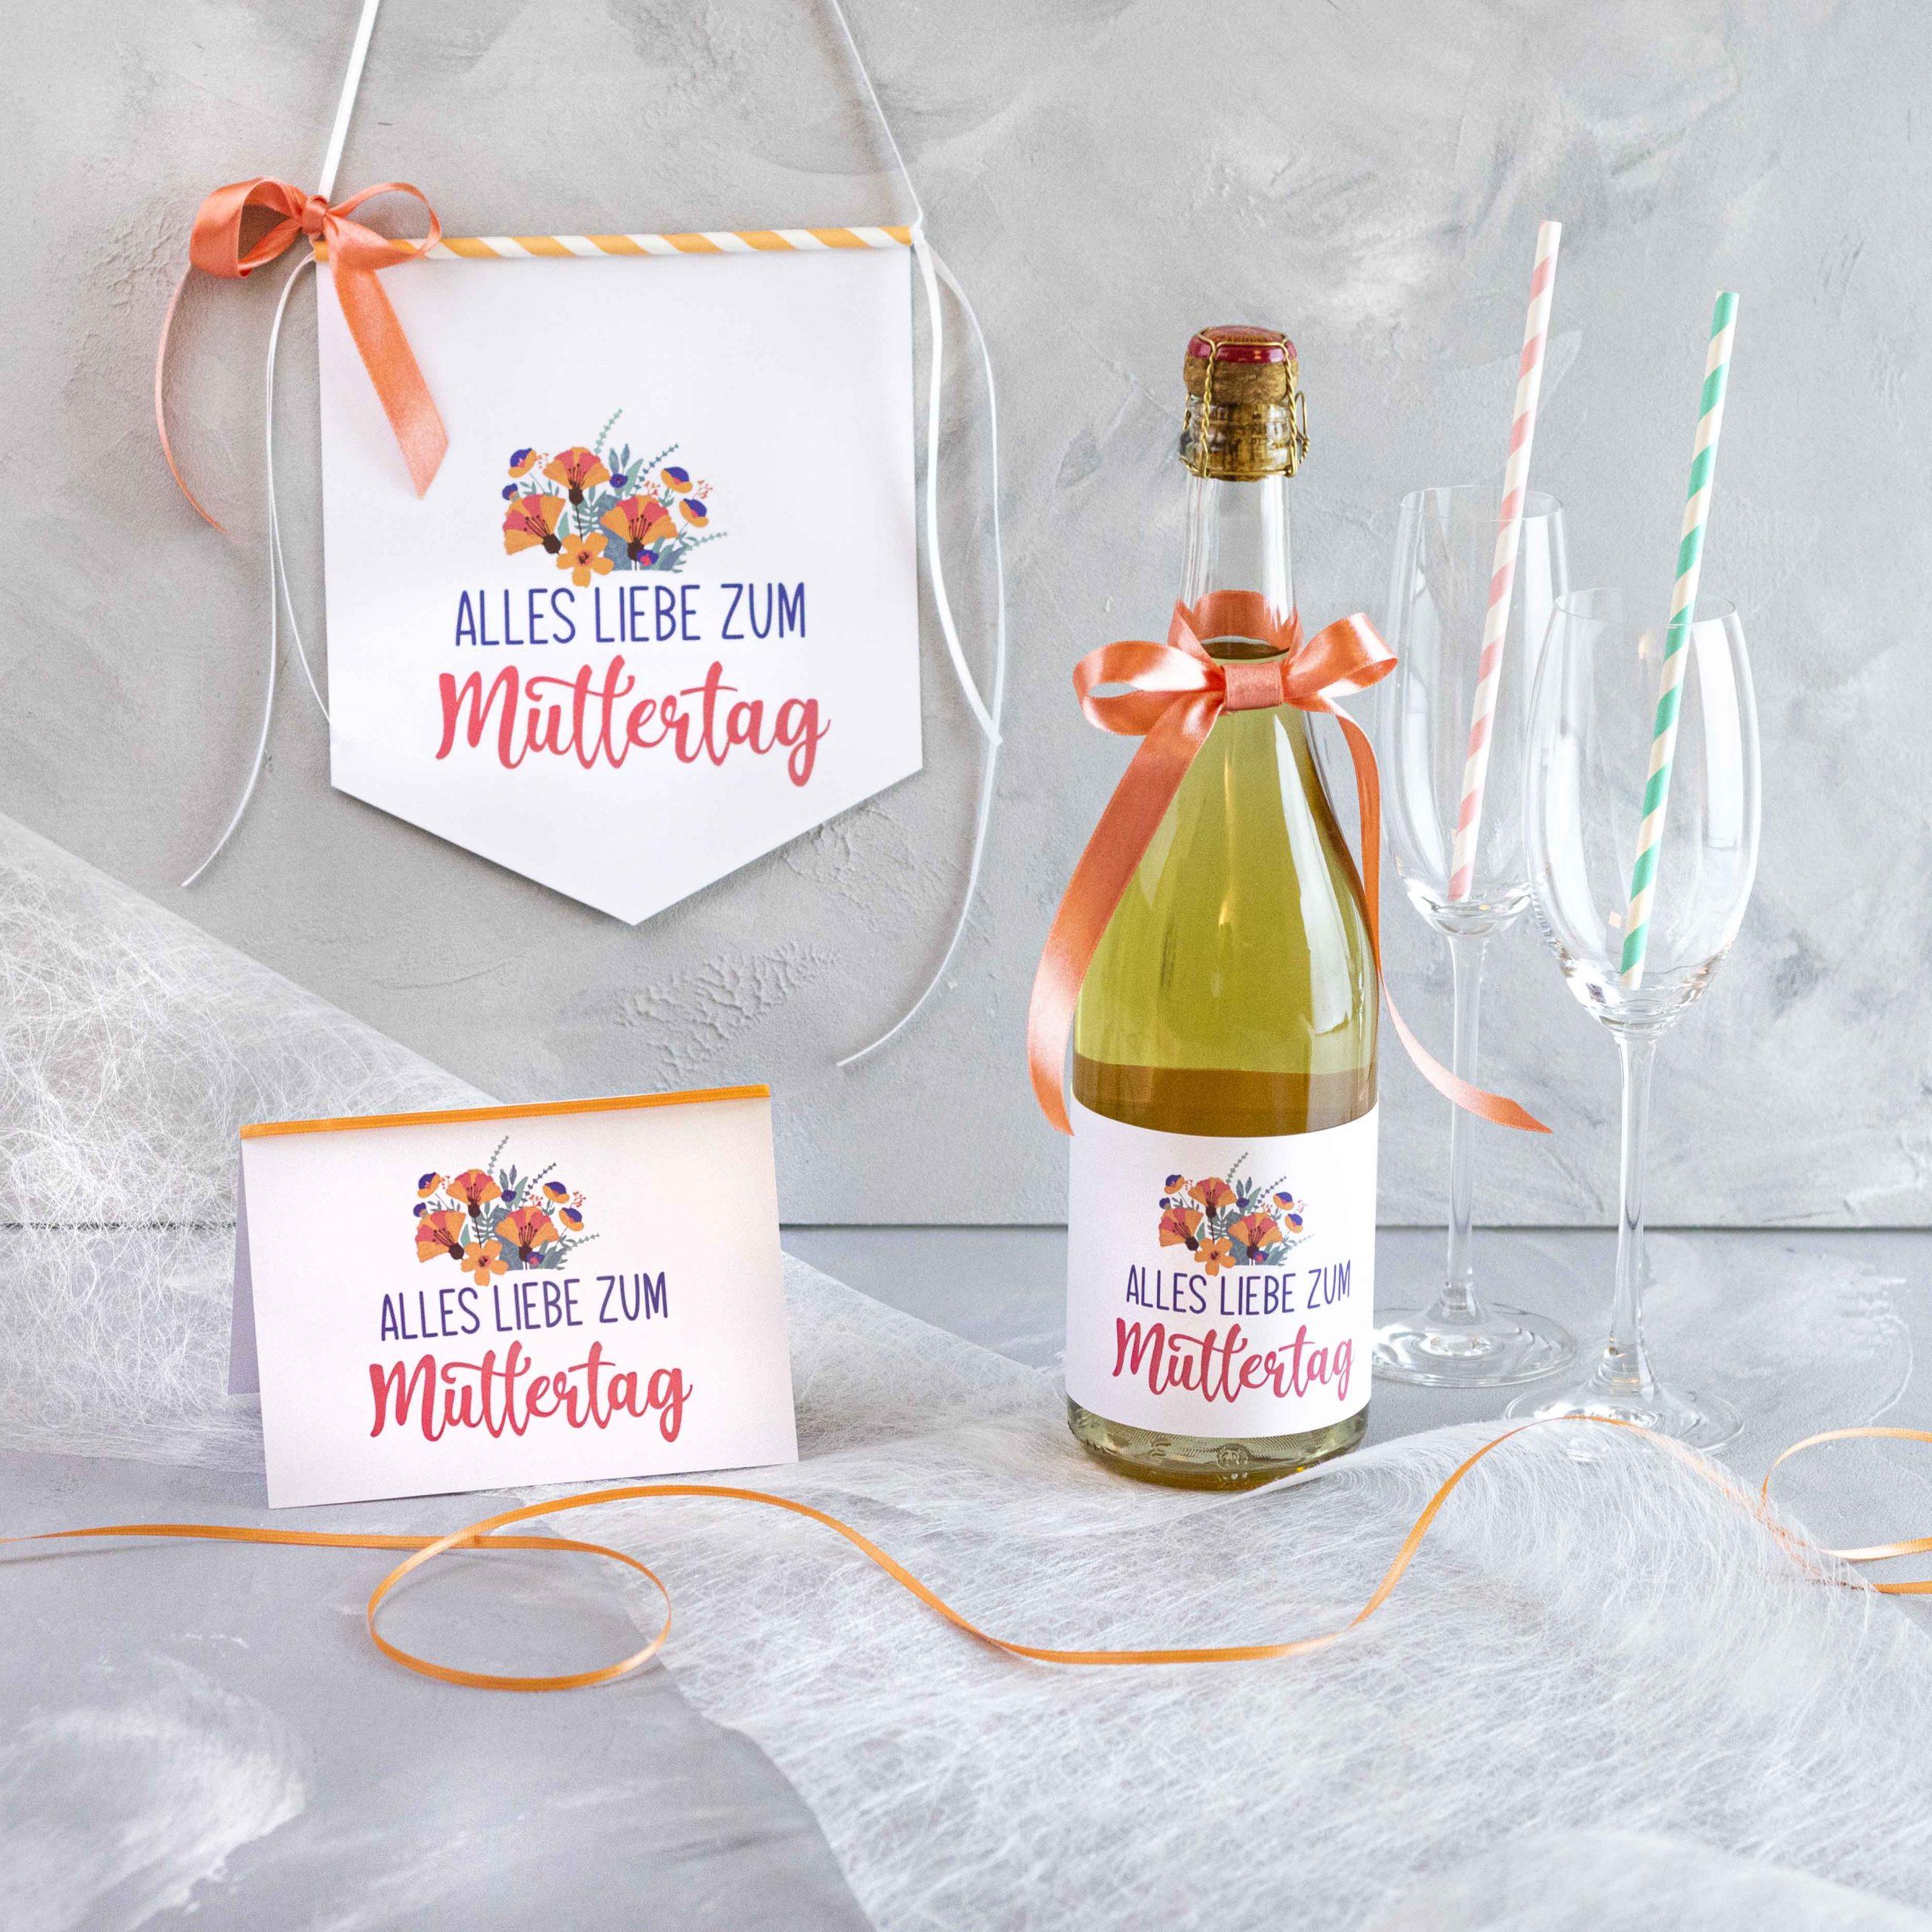 Last-Minute-Muttertags-Printable für dich!